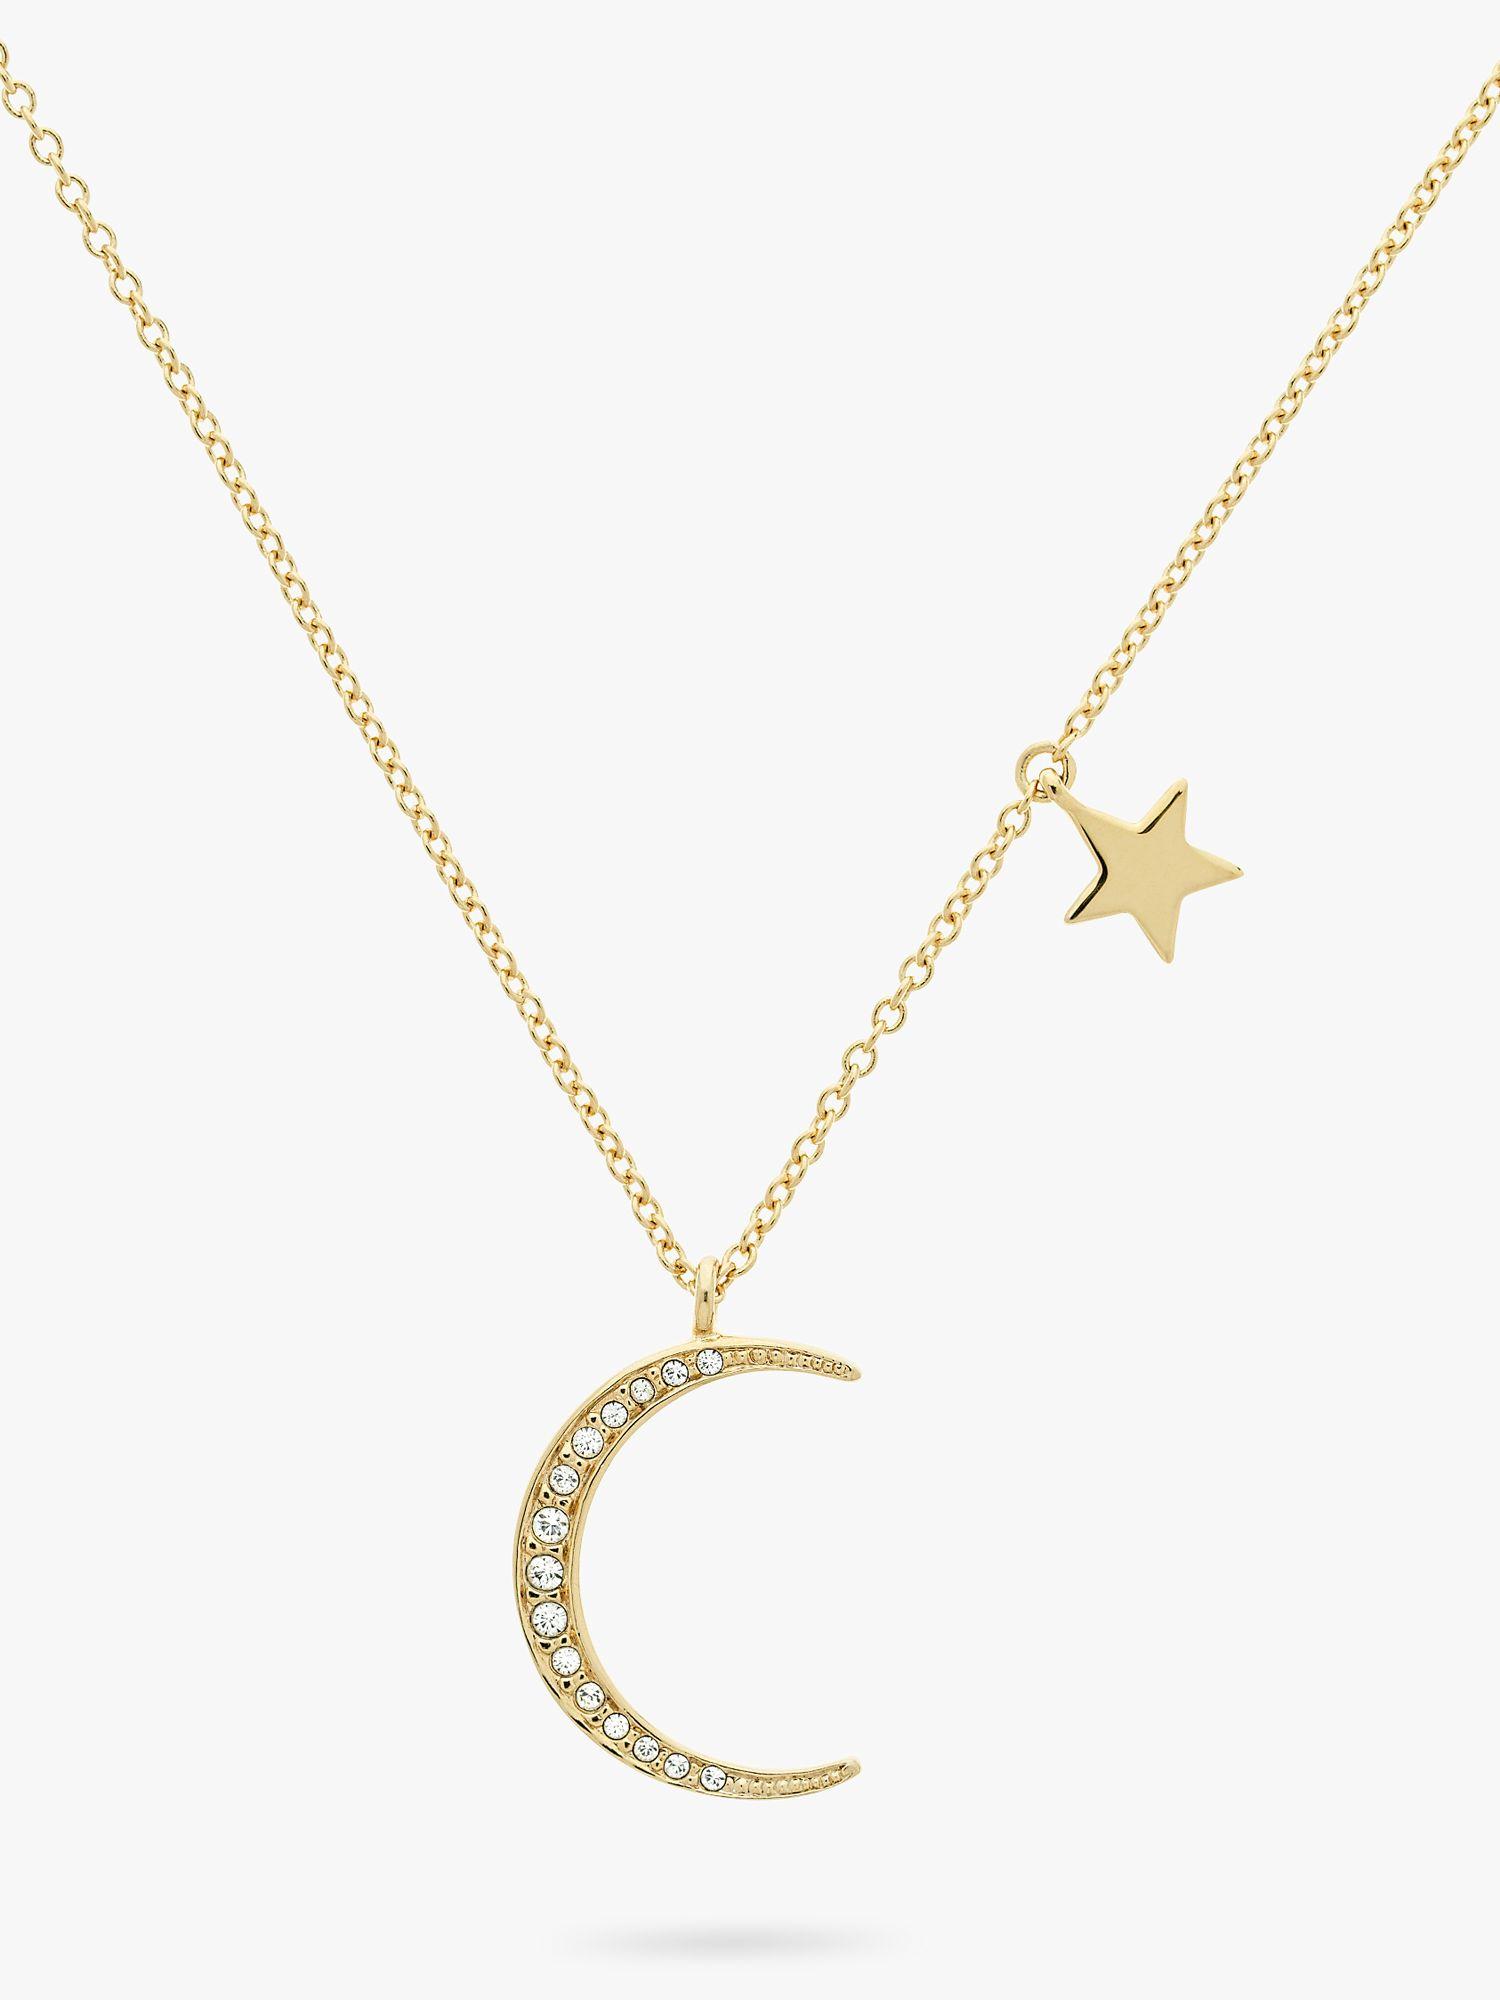 Melissa Odabash Melissa Odabash Swarovski Crystal Moon Pendant Necklace